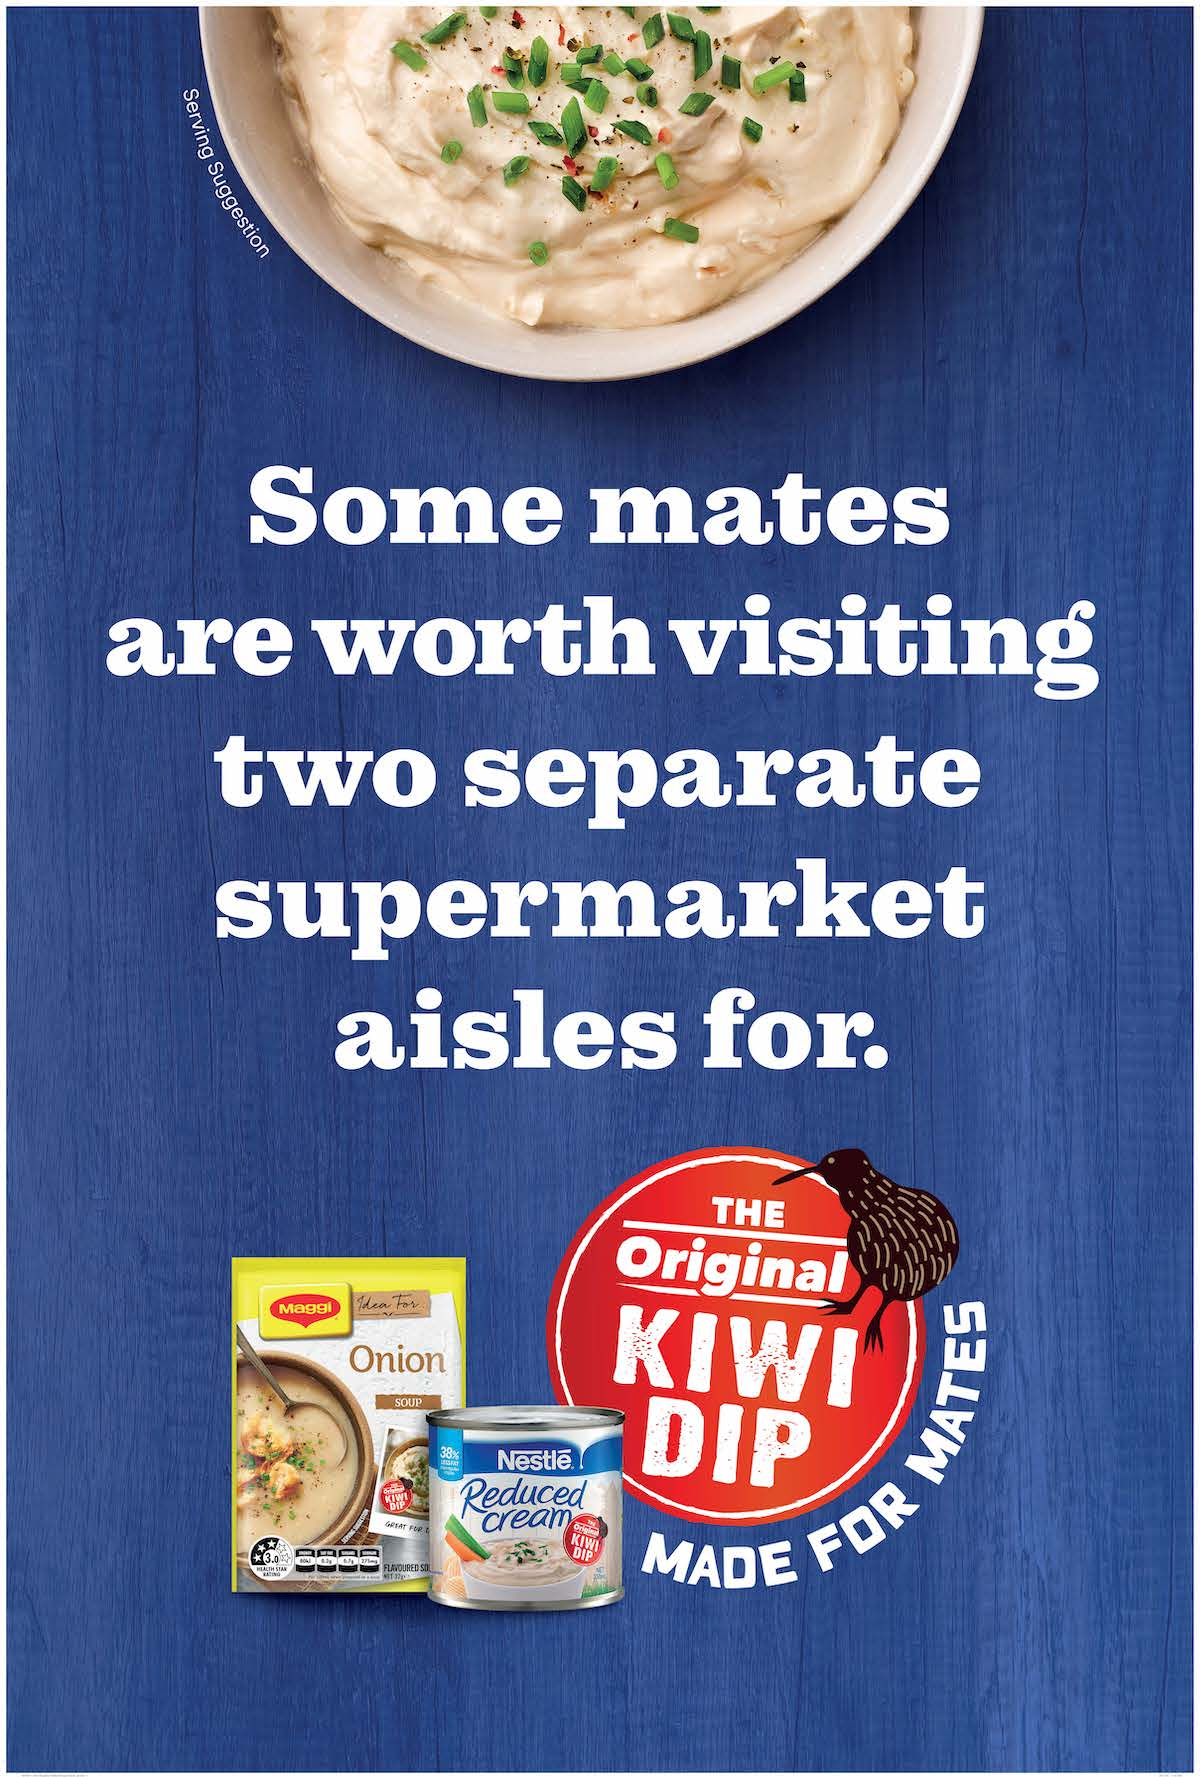 Nestlé and Original Kiwi Dip introduce 'Dipcoms' in latest campaign via Saatchi & Saatchi NZ